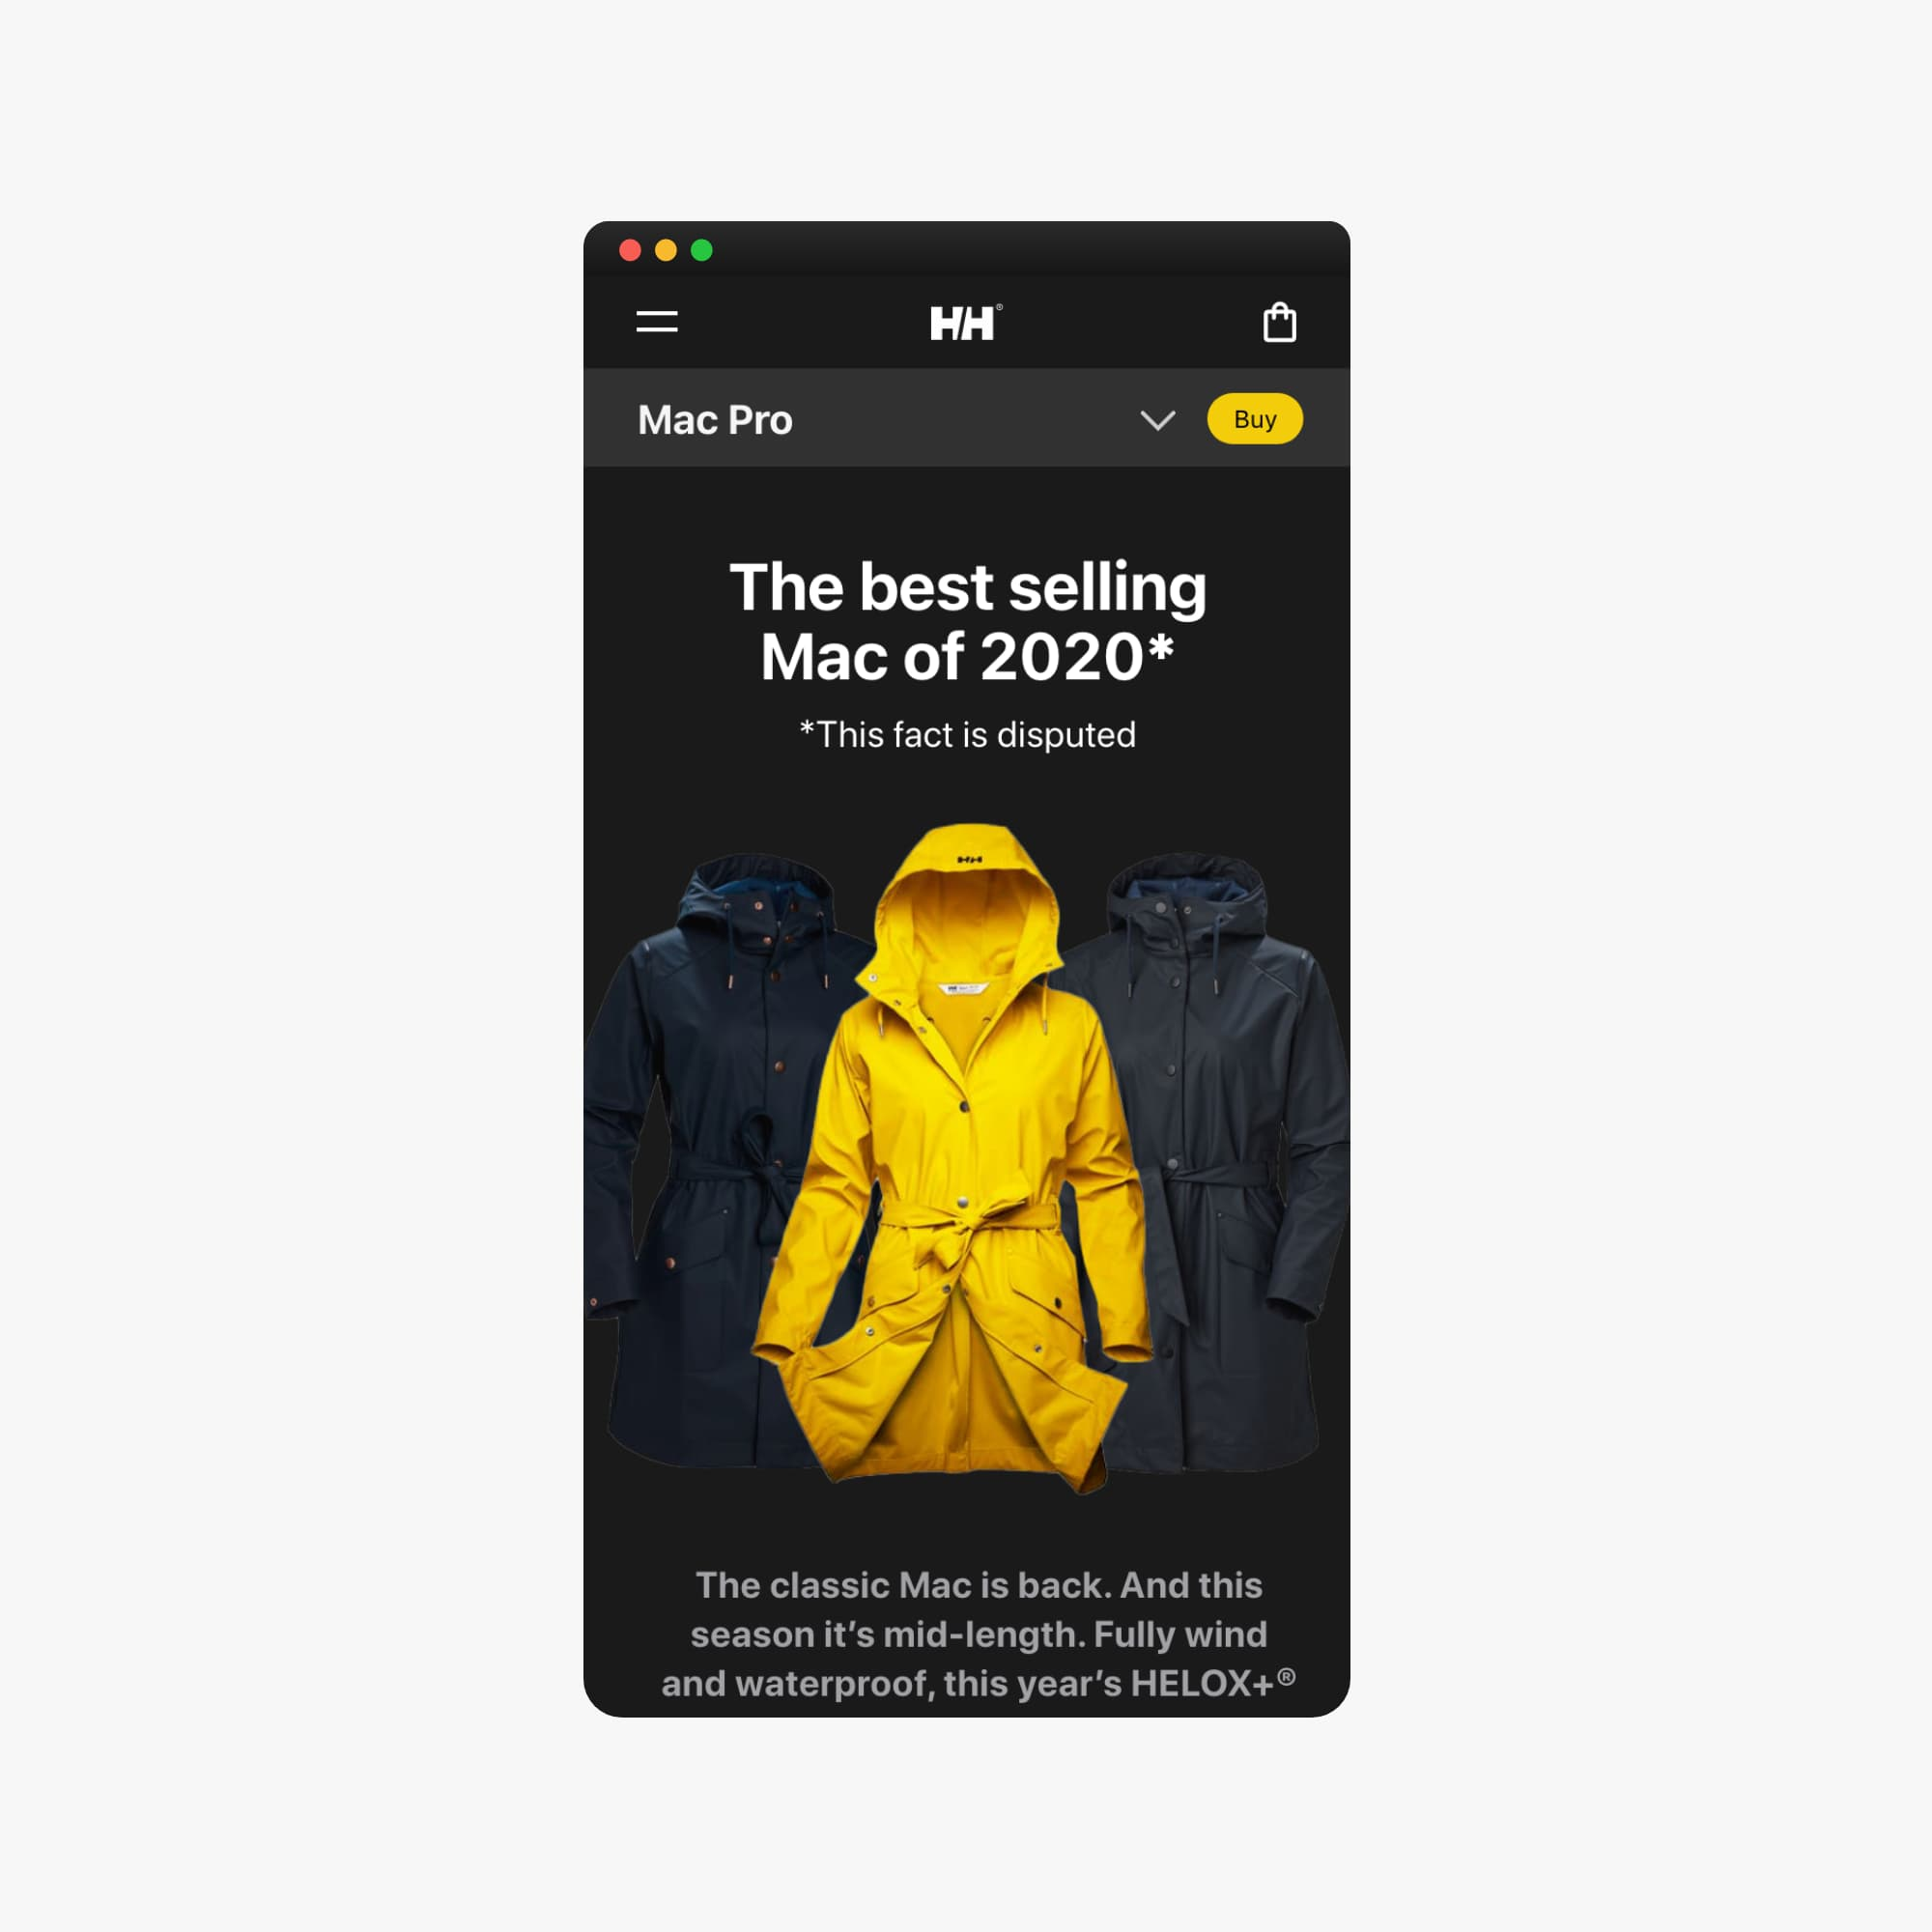 amy-jones-mac-raincoat-apple-parody-1@2x